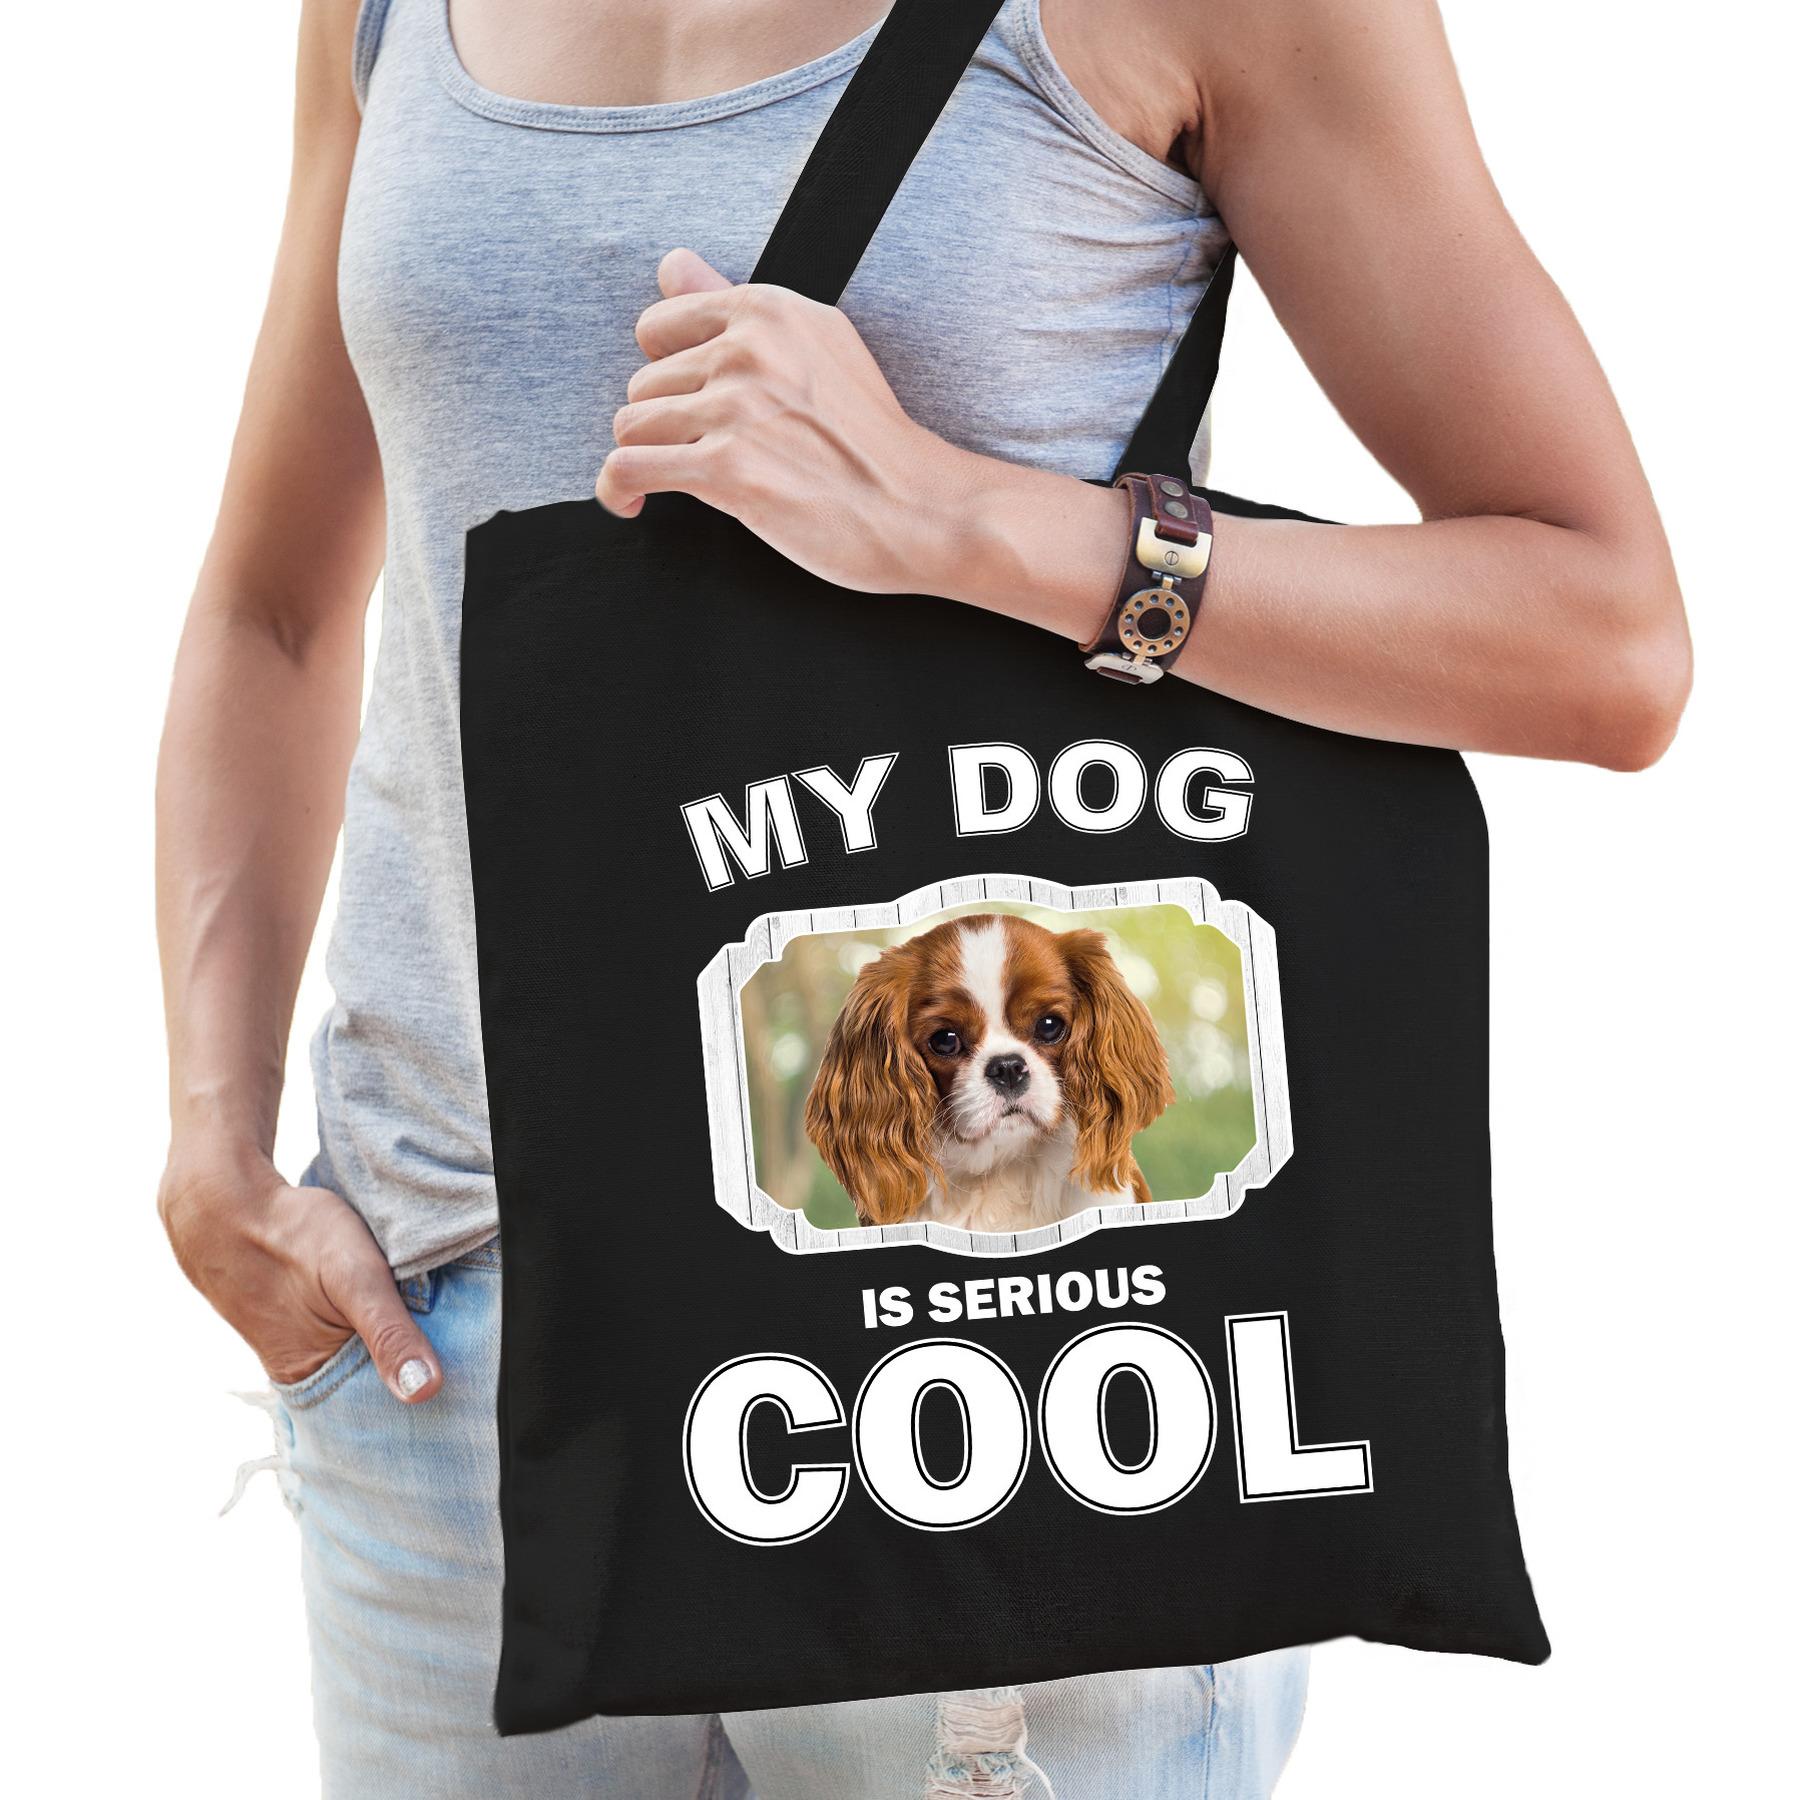 Katoenen tasje my dog is serious cool zwart - Charles spaniel honden cadeau tas